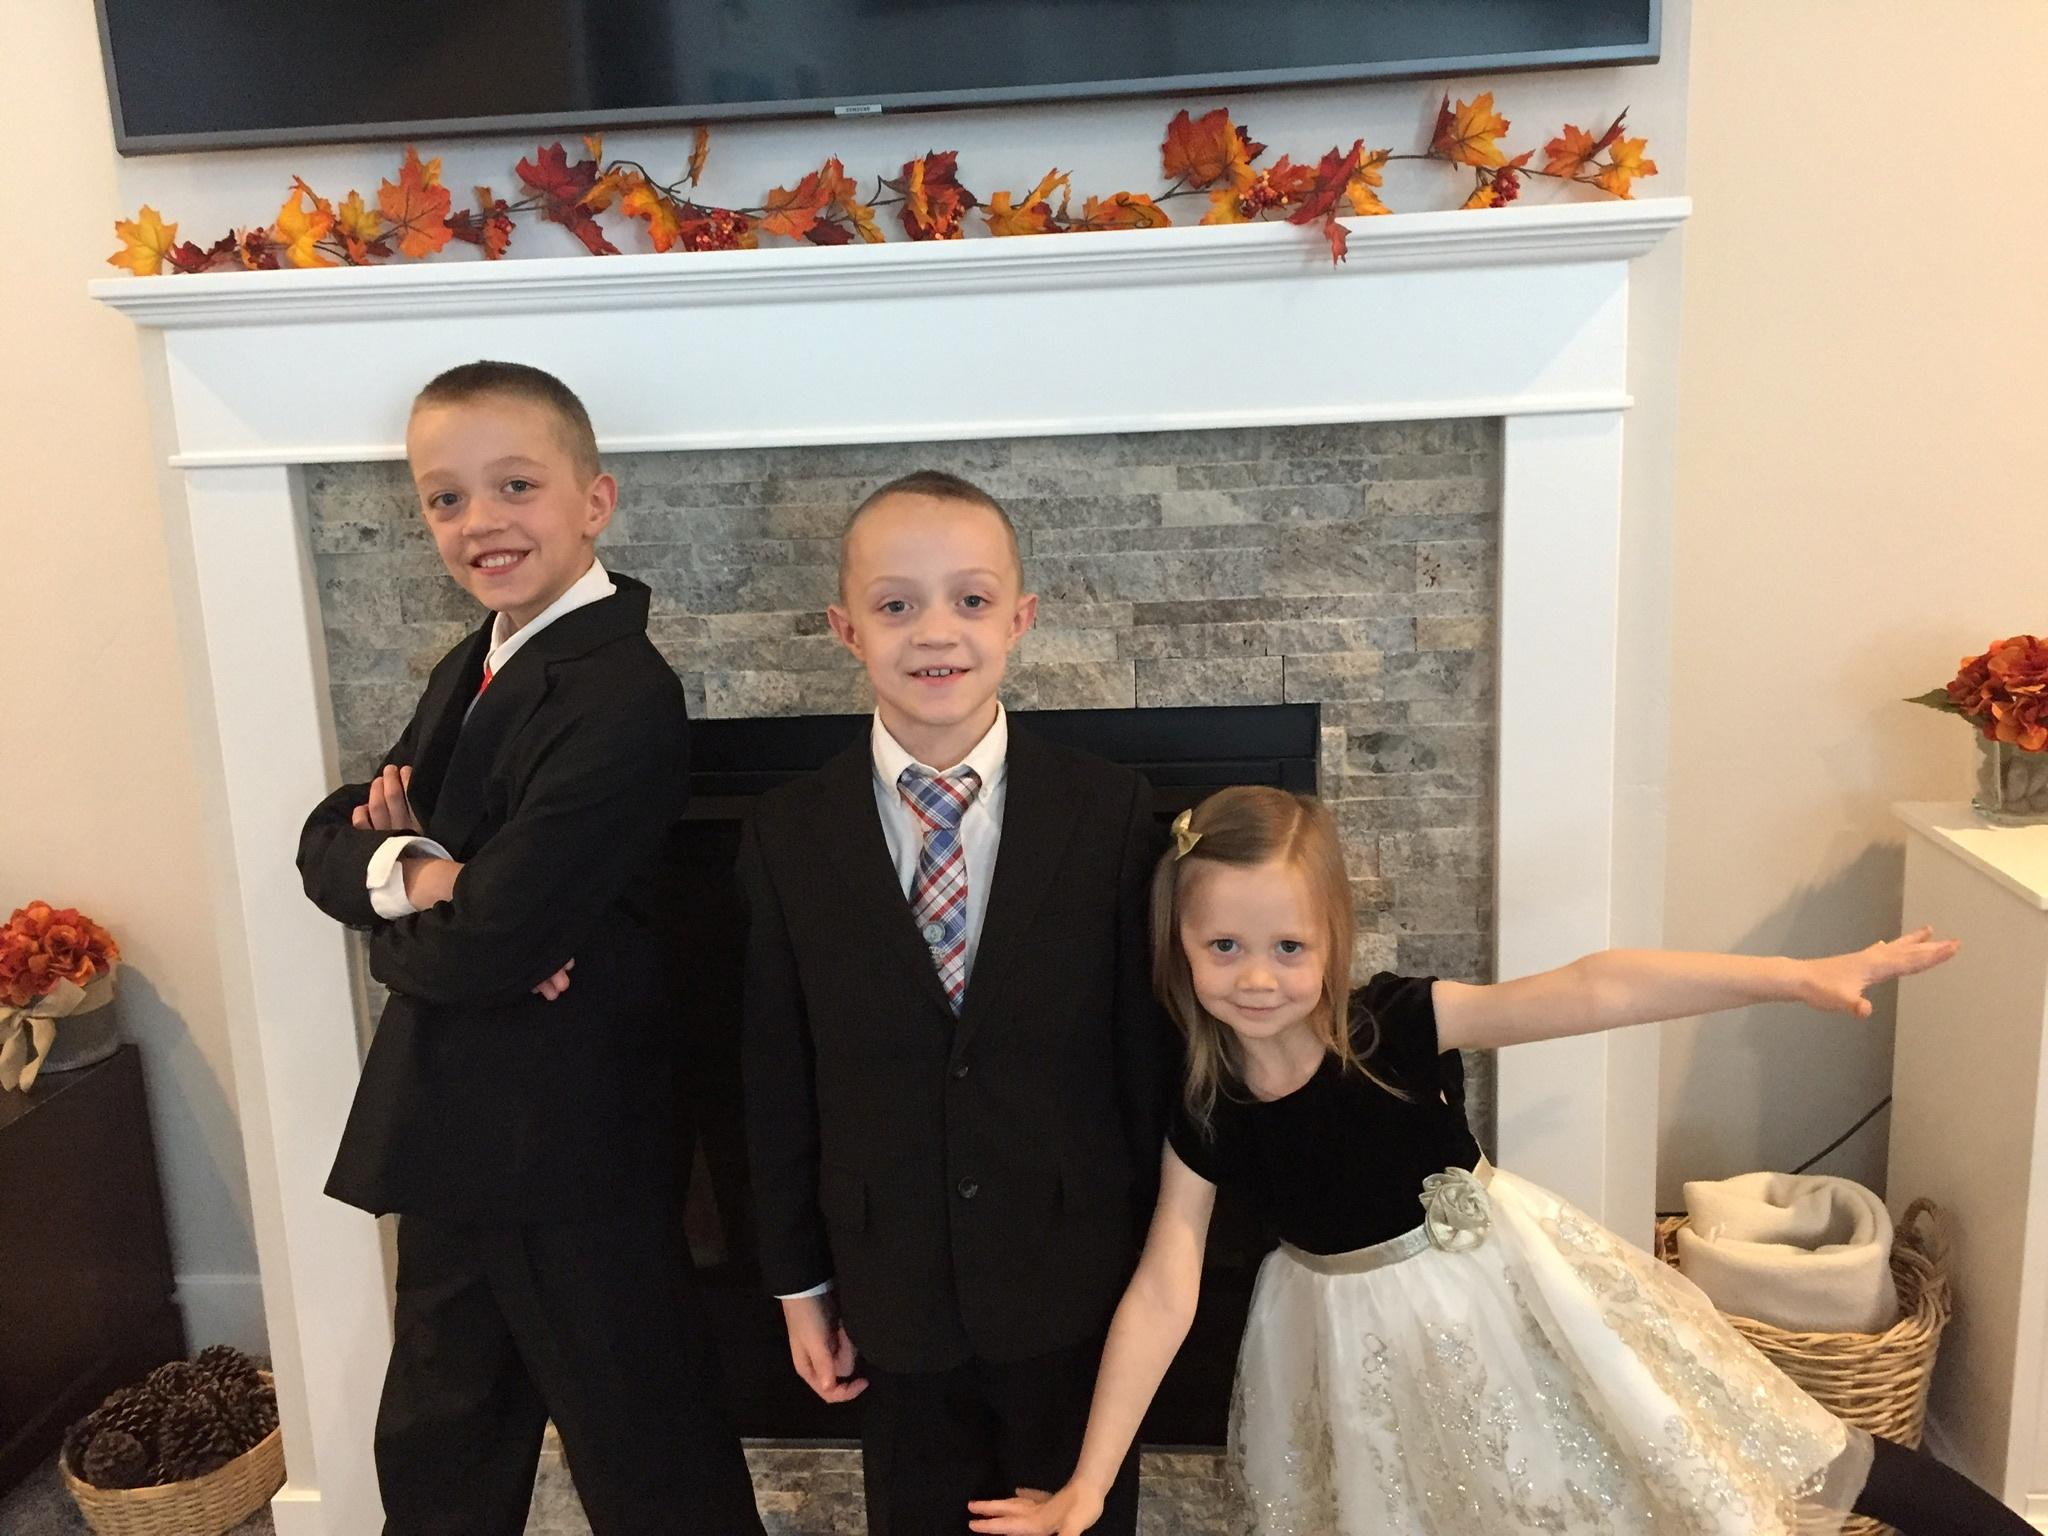 The Sweeten children, Kaden, Jackson and Emily, are seen at their home in Layton, Utah, U.S., November 8, 2020. Picture taken November 8, 2020.  Tristen Sweeten/Handout via REUTERS